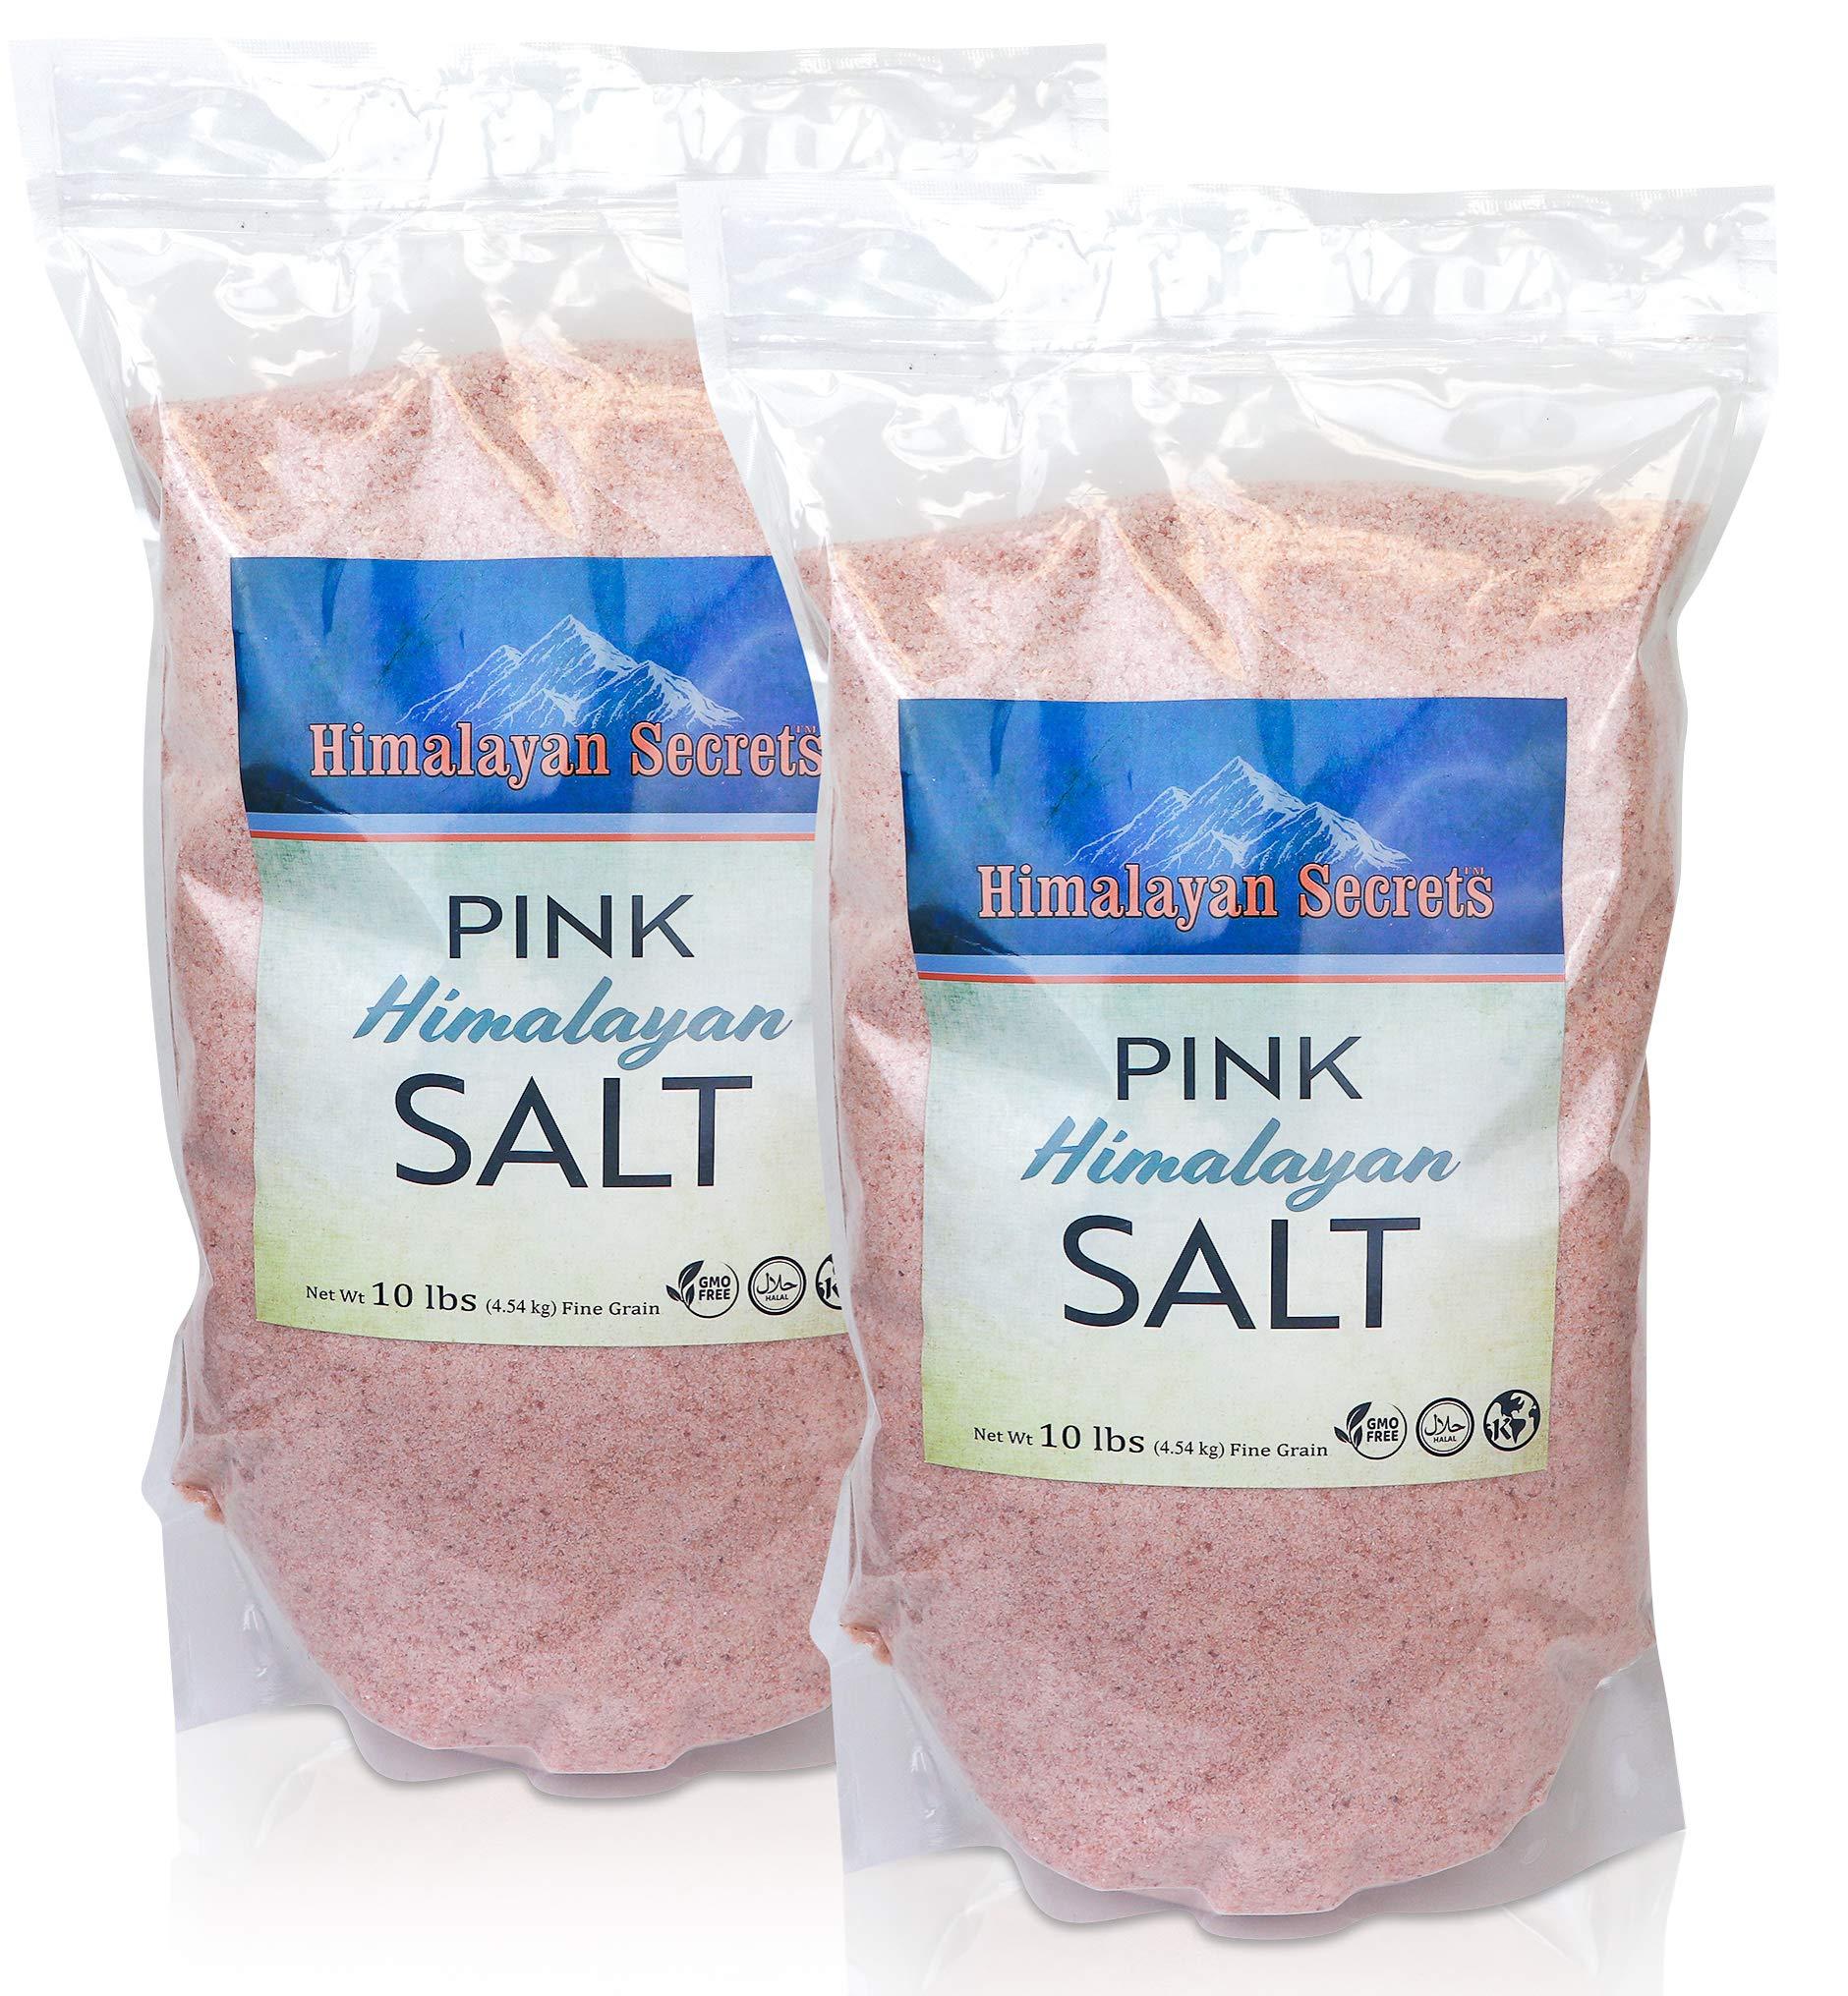 Himalayan Secrets Pink Rock Salt - 10LB - Coarse, Fine, Powder Grain Bulk Size - 100% Natural & Unrefined (20 LB Fine (0.3-0.5mm))